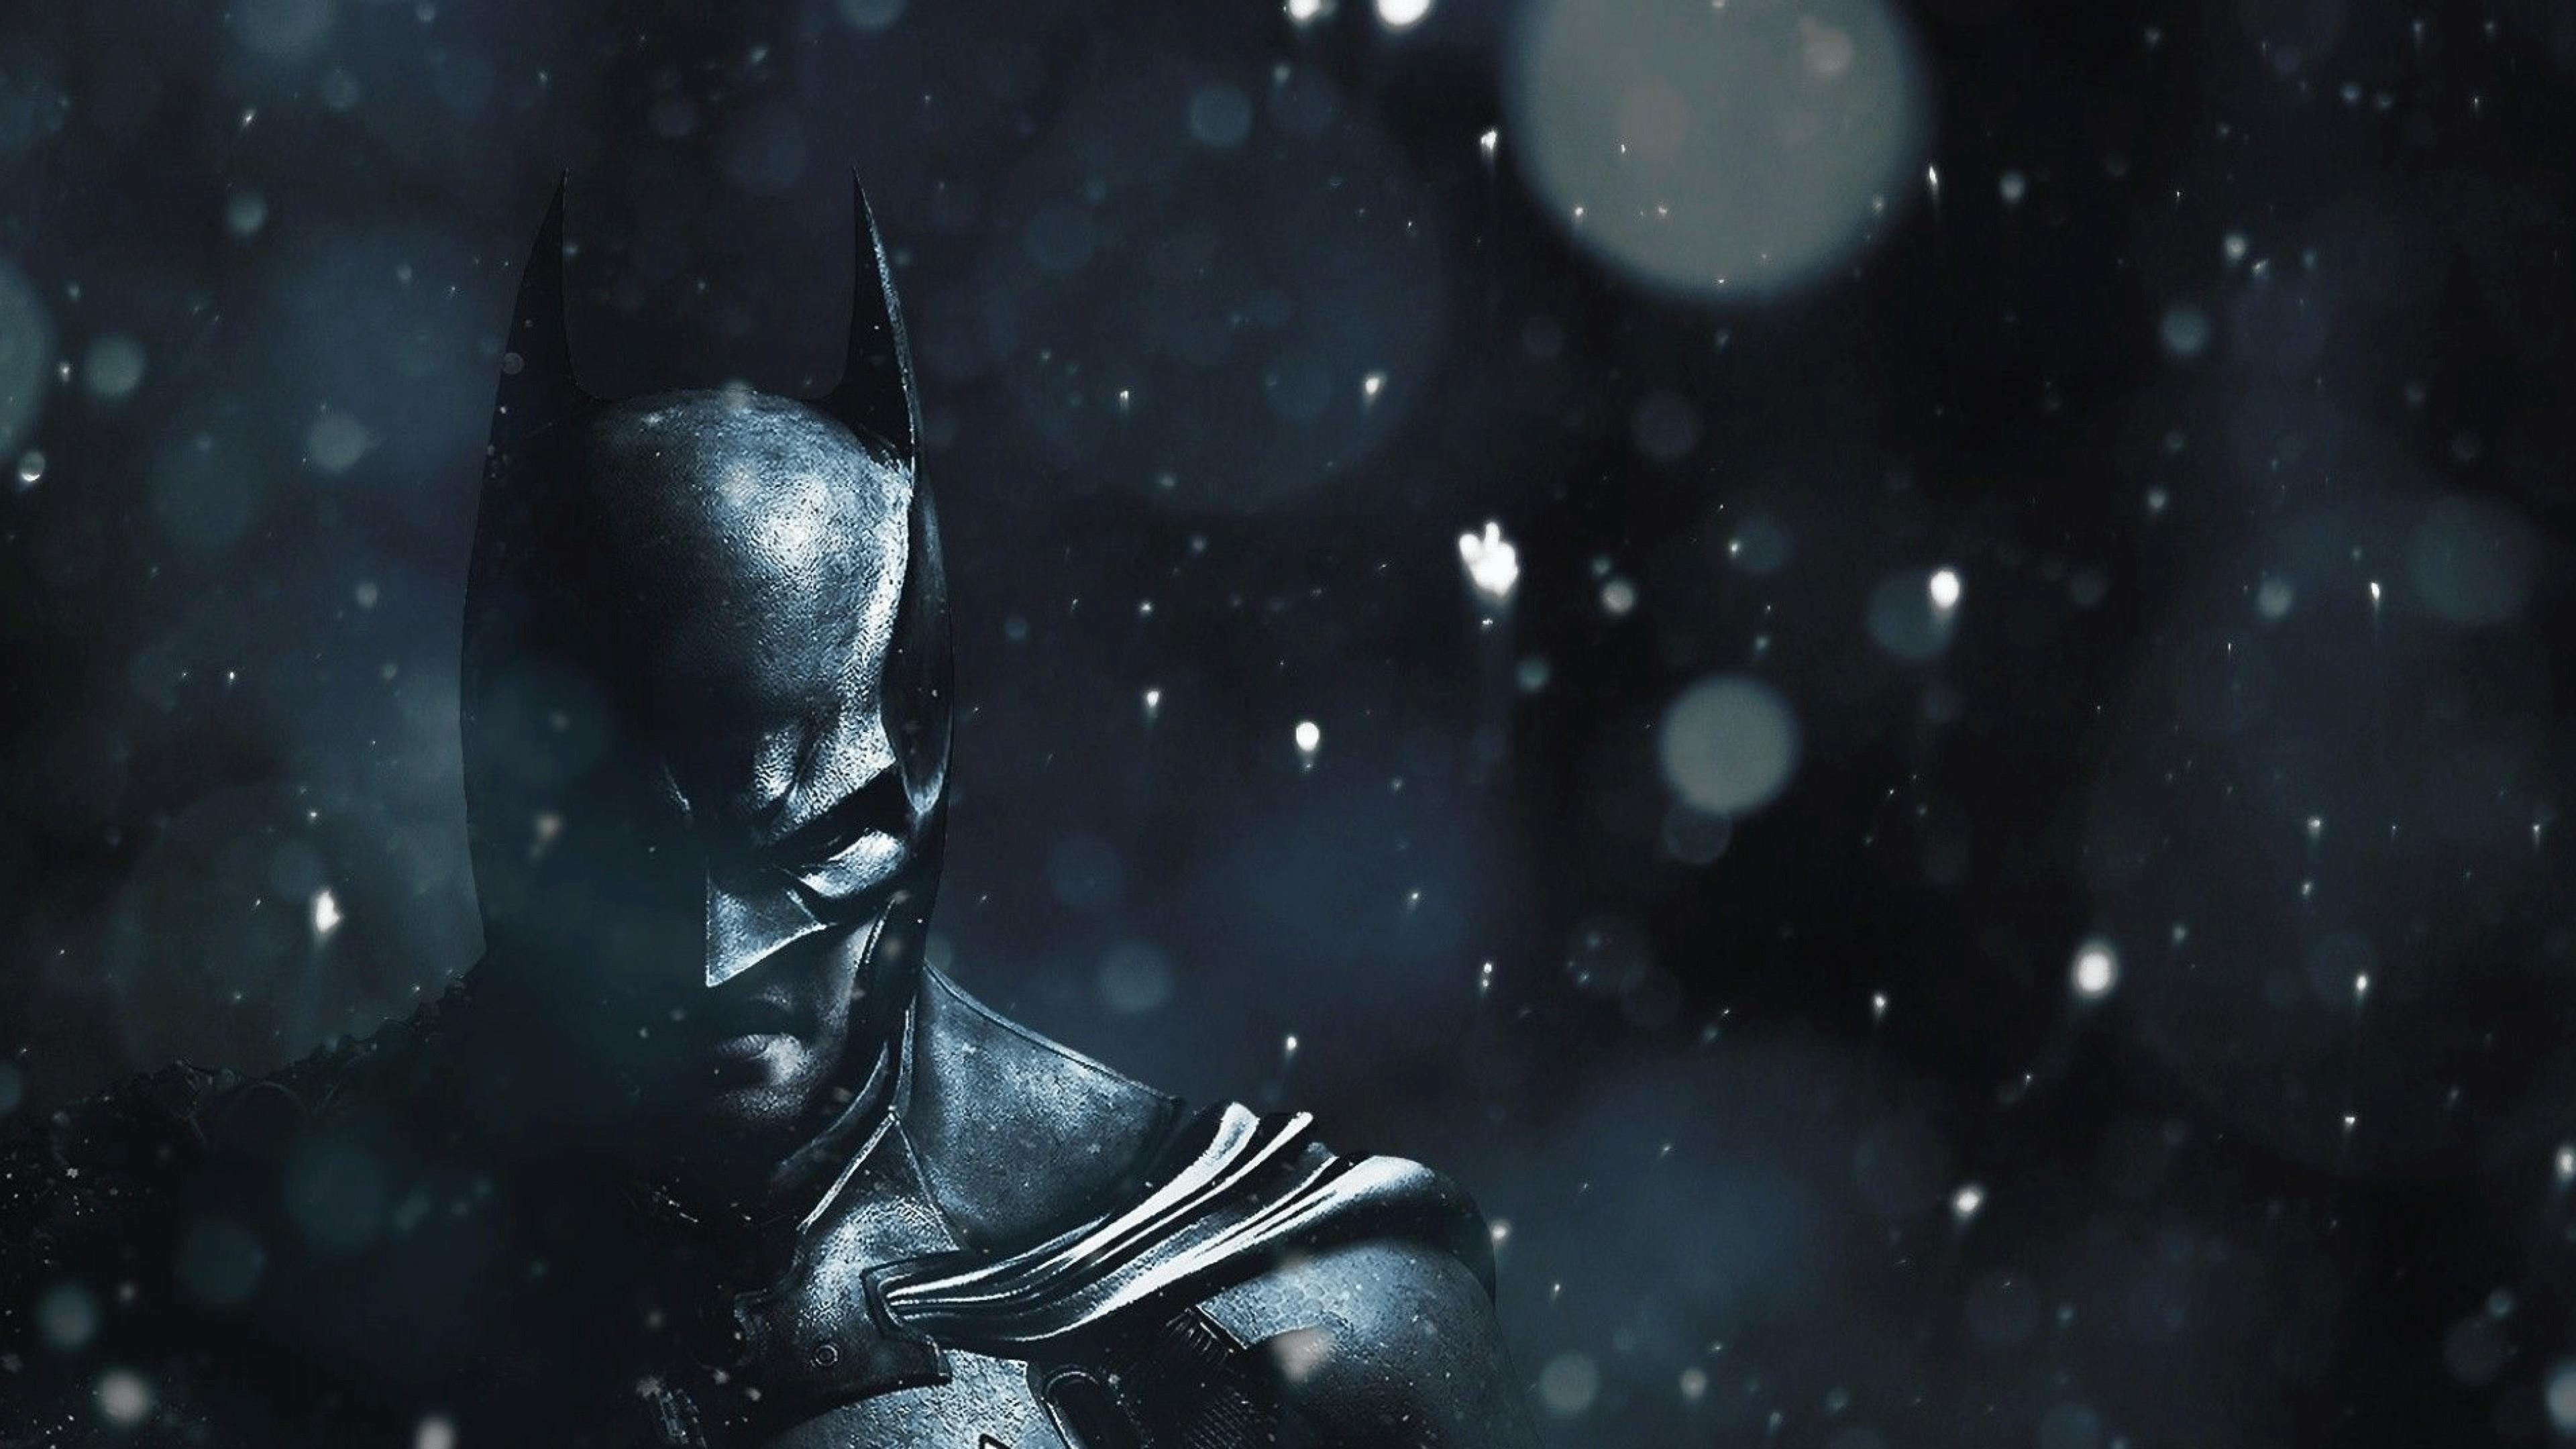 92 4k Batman